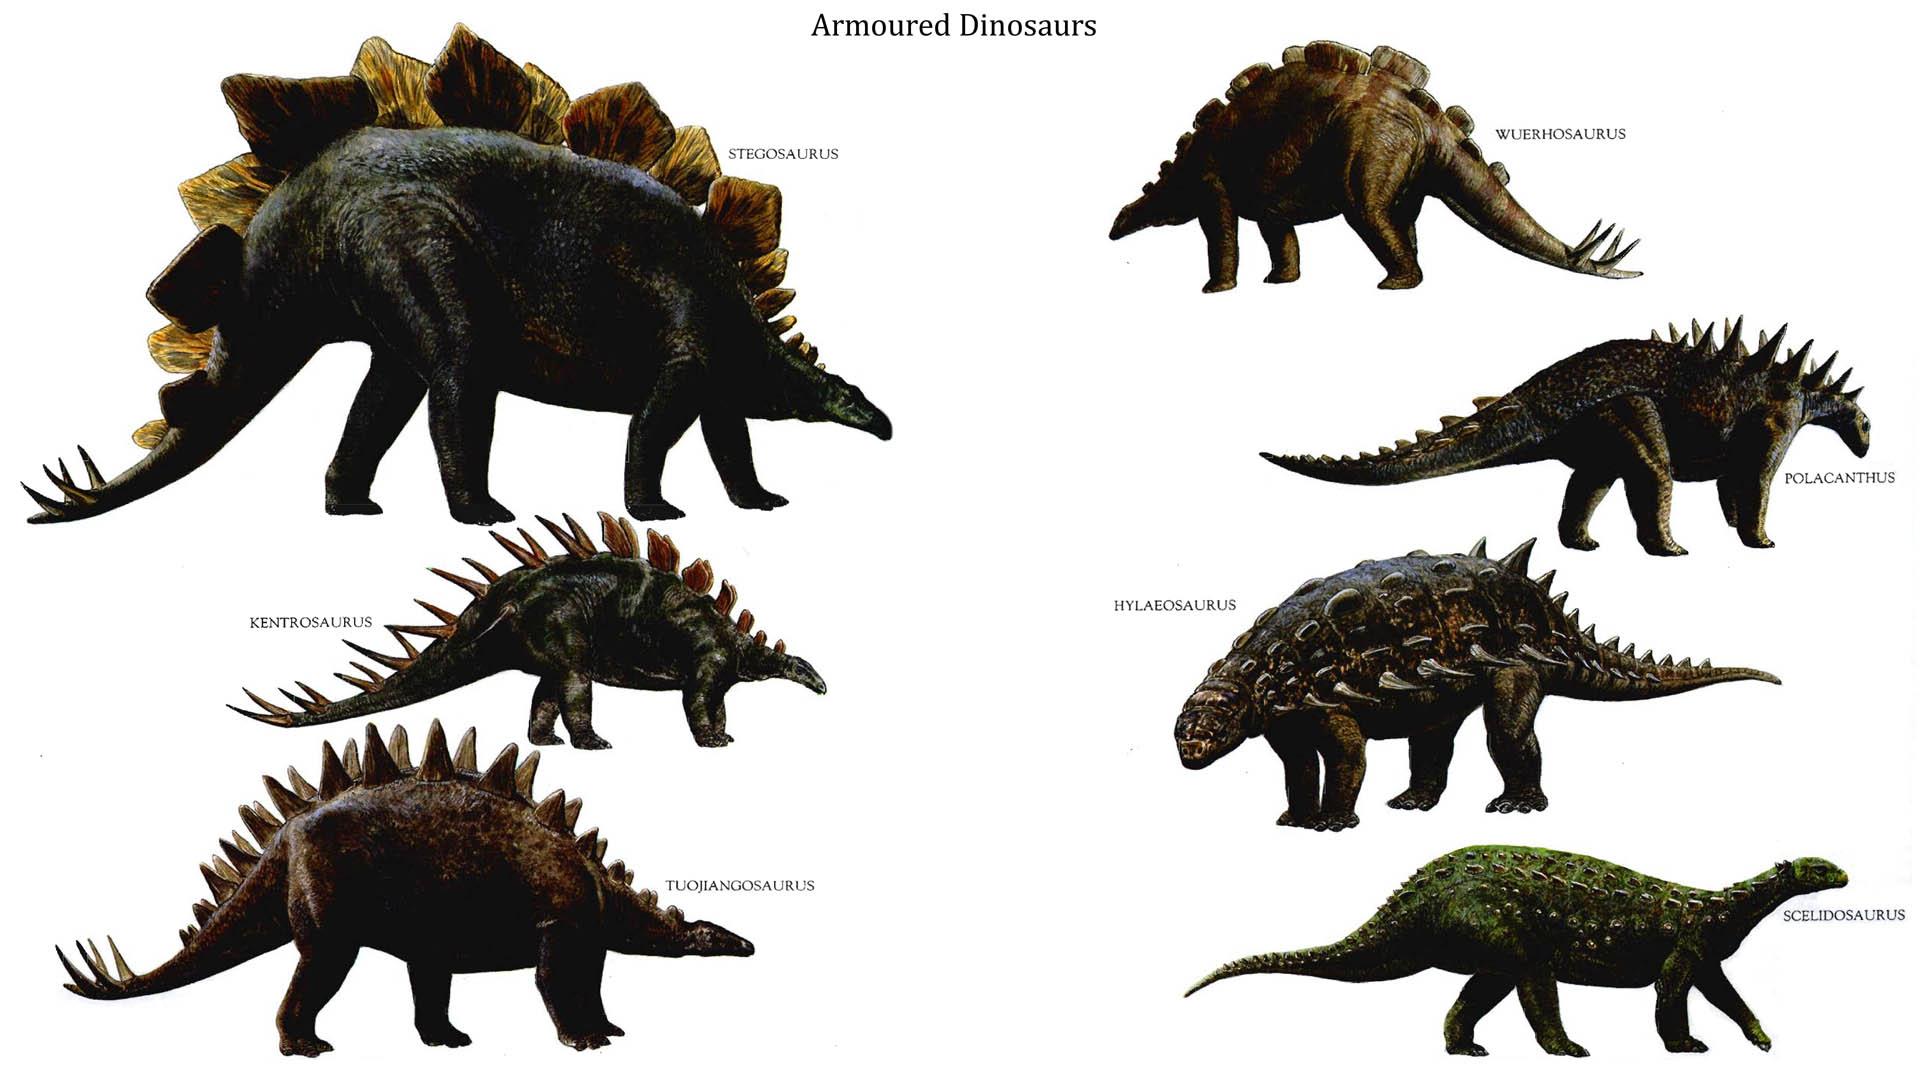 Armoured Dinosaurs   Strange Dinosaurs Wallpaper Image 1920x1080